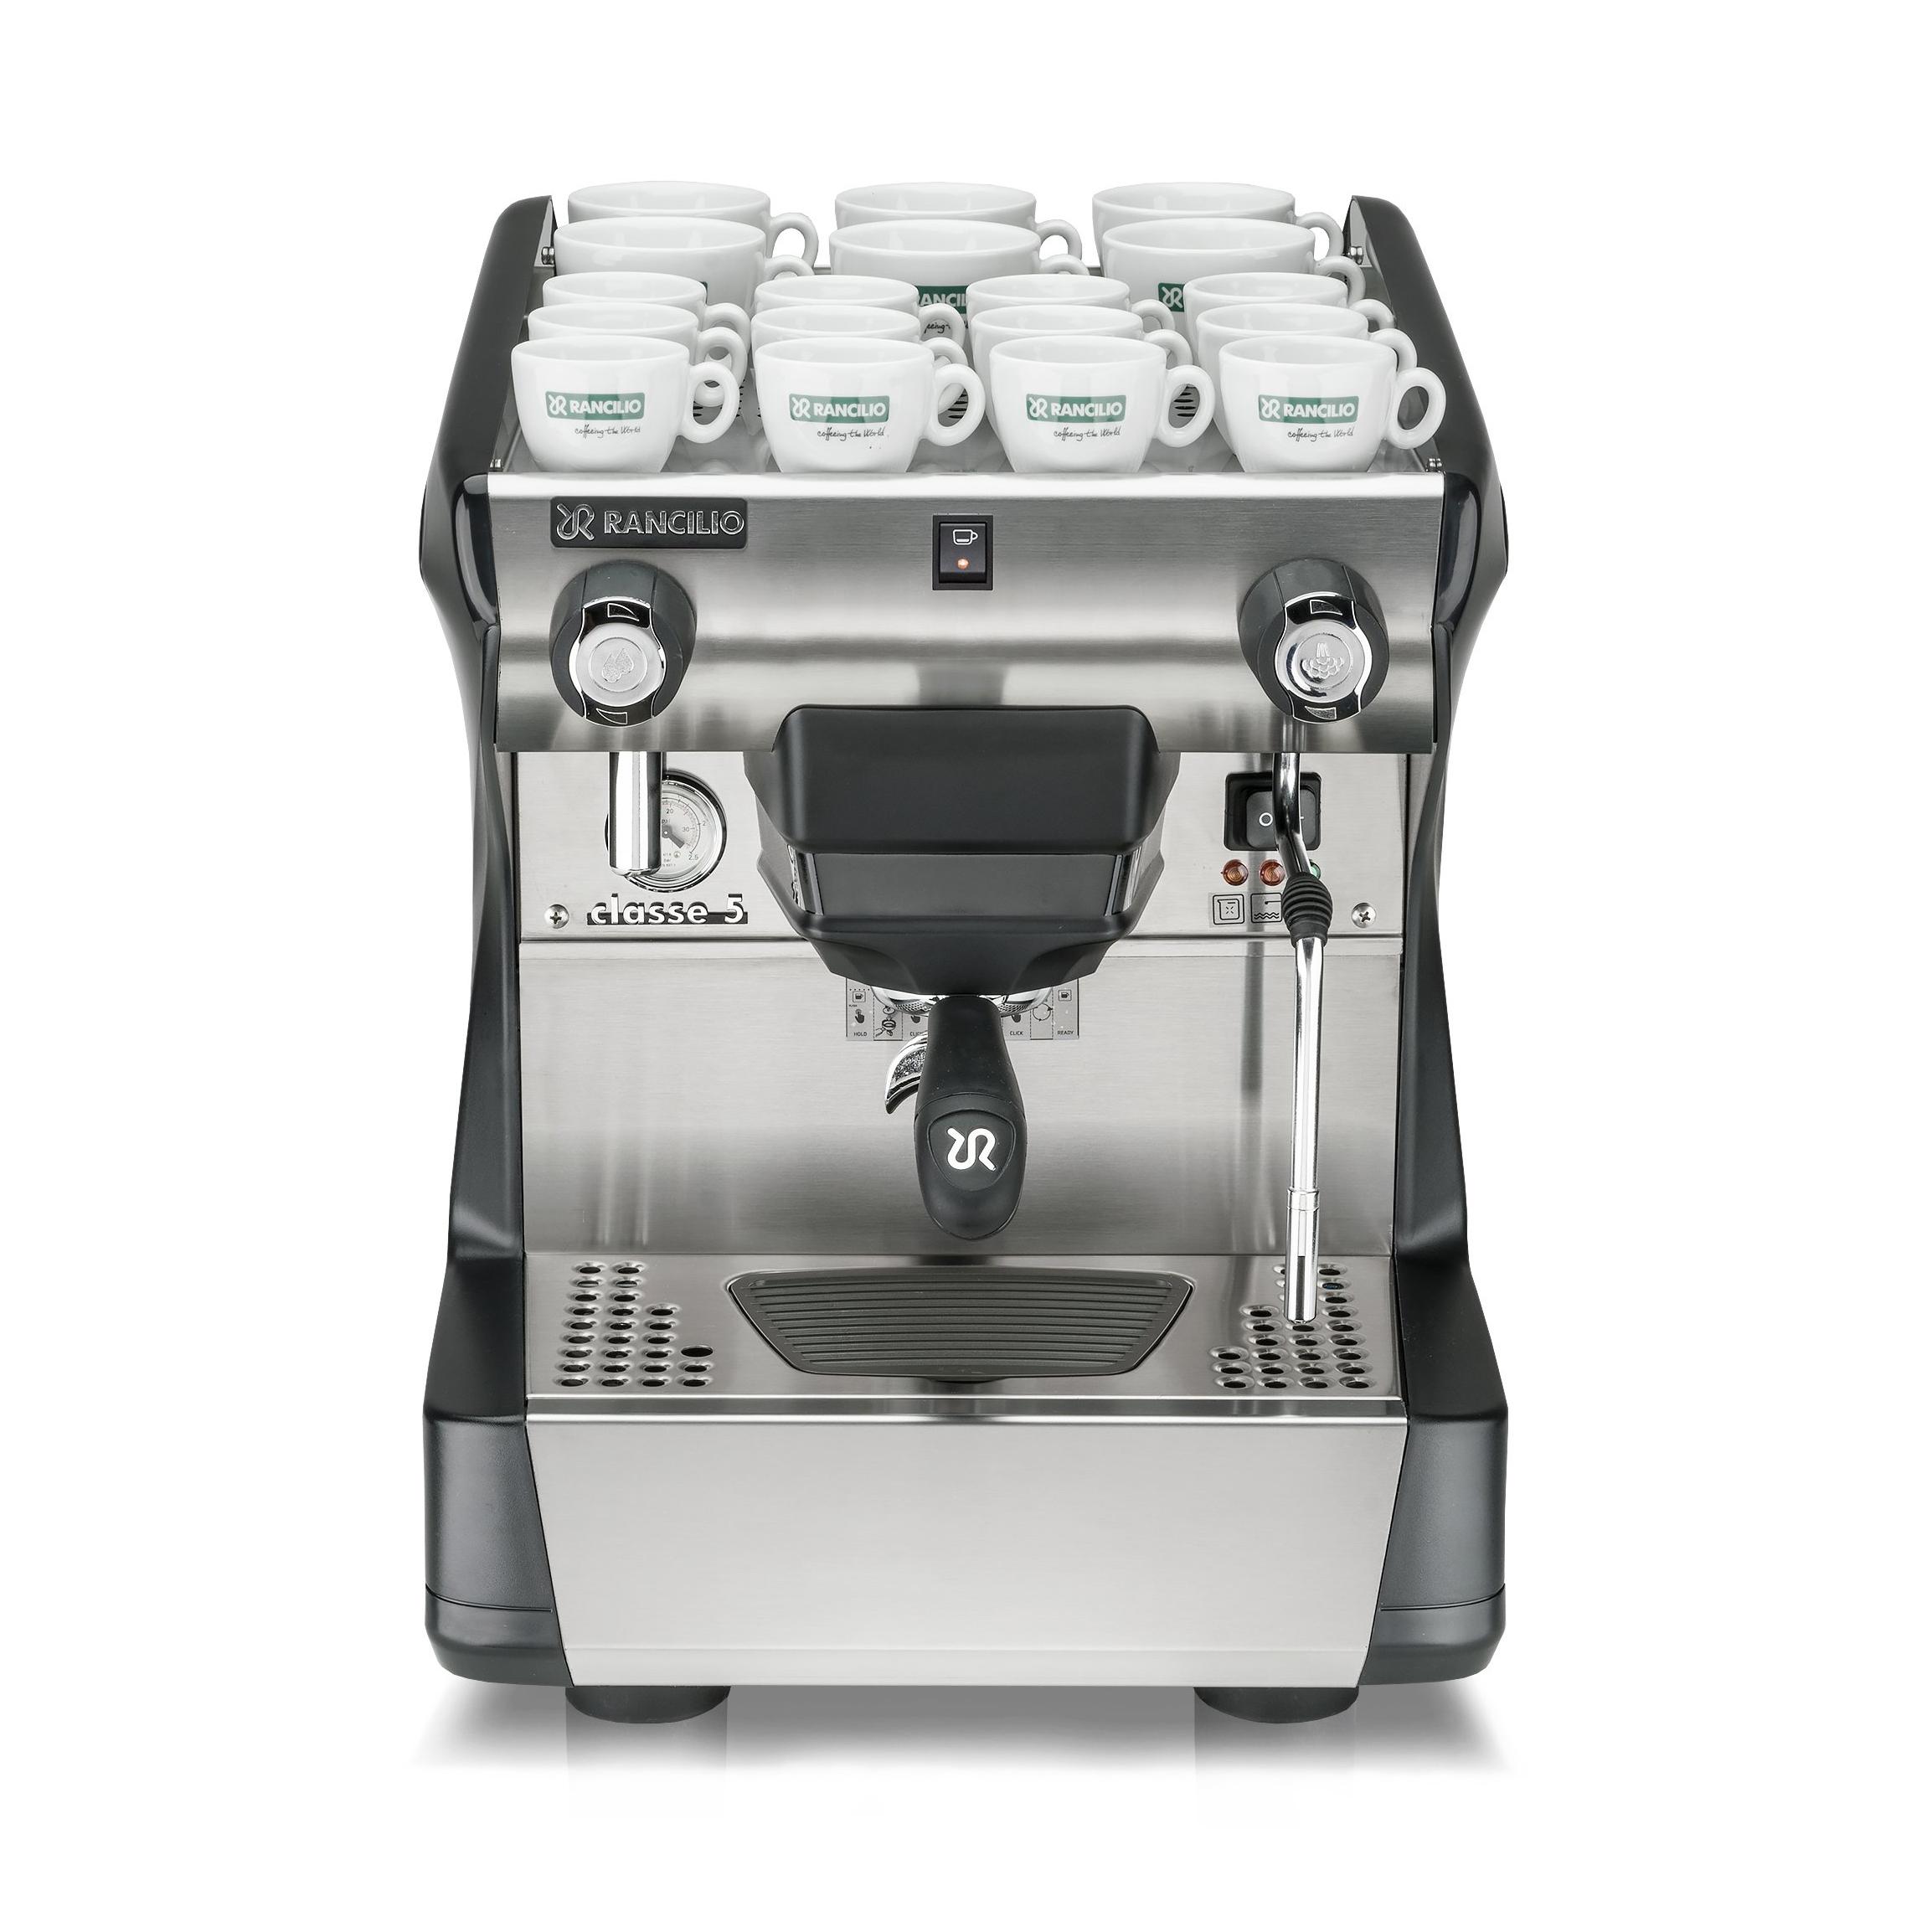 Rancilio Classe 5 ST-1 Espresso Machine Water Tank